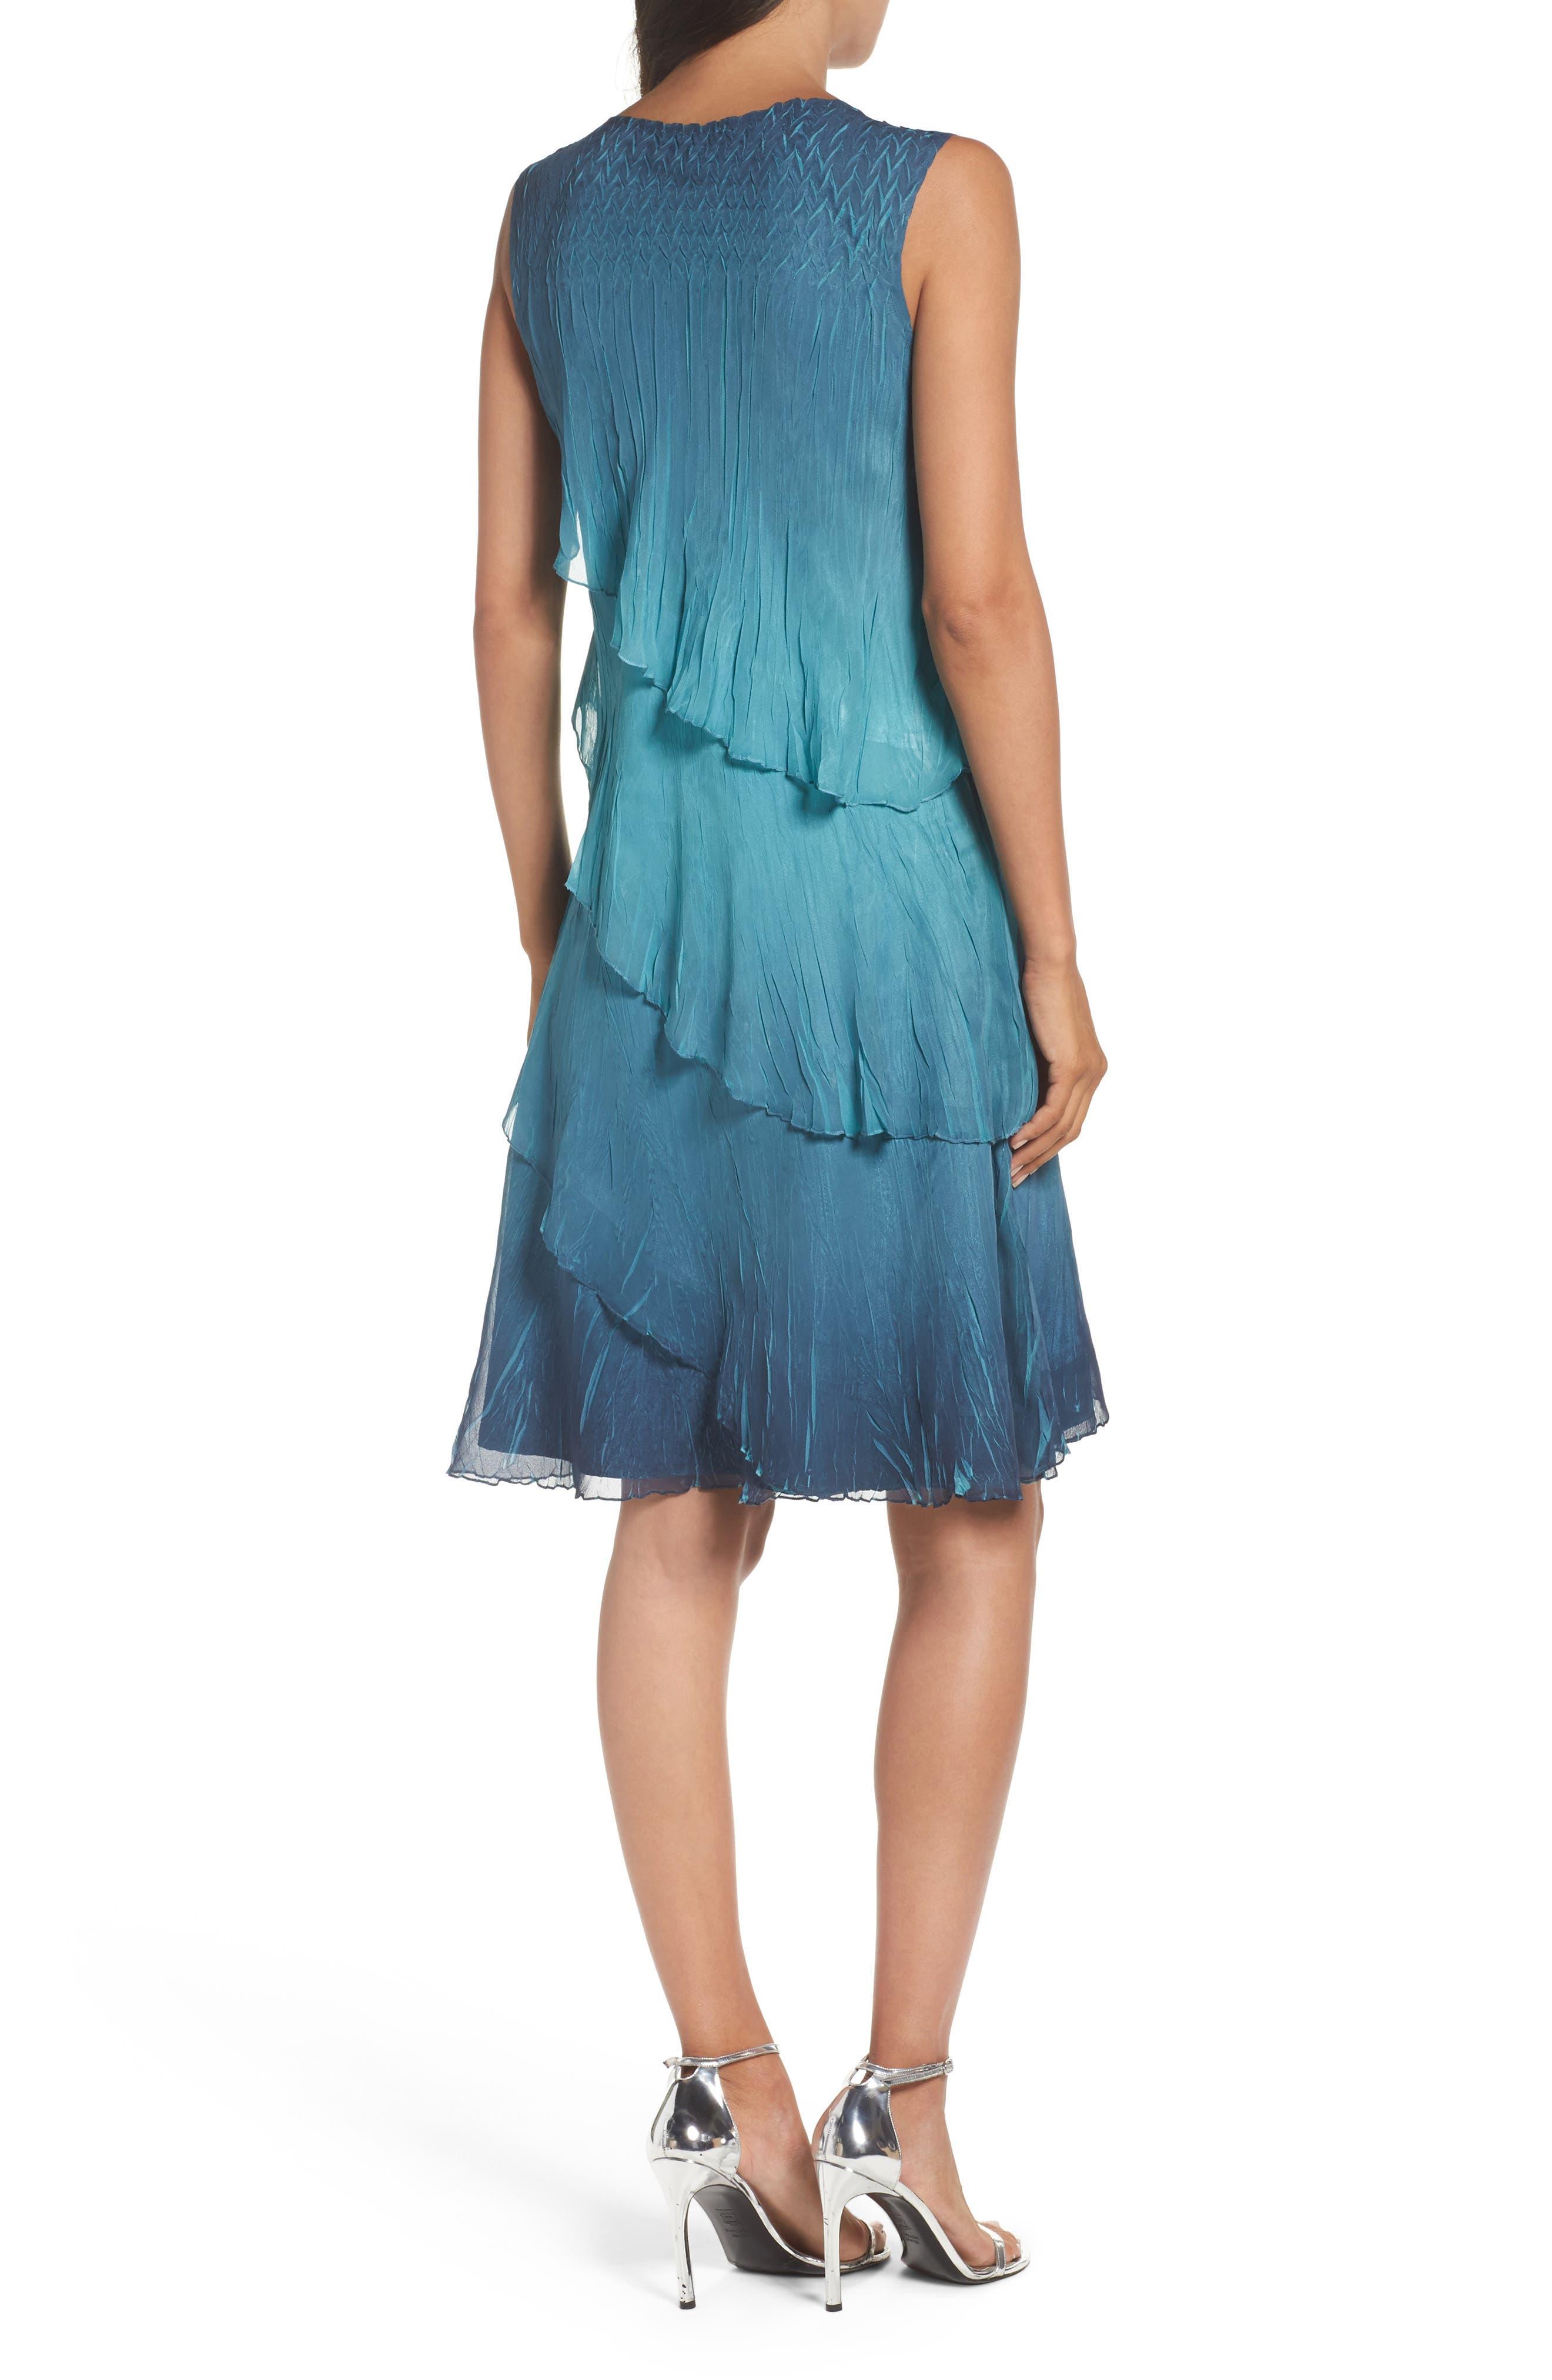 Tiered Chiffon Shift Dress with Shawl,                             Alternate thumbnail 2, color,                             491